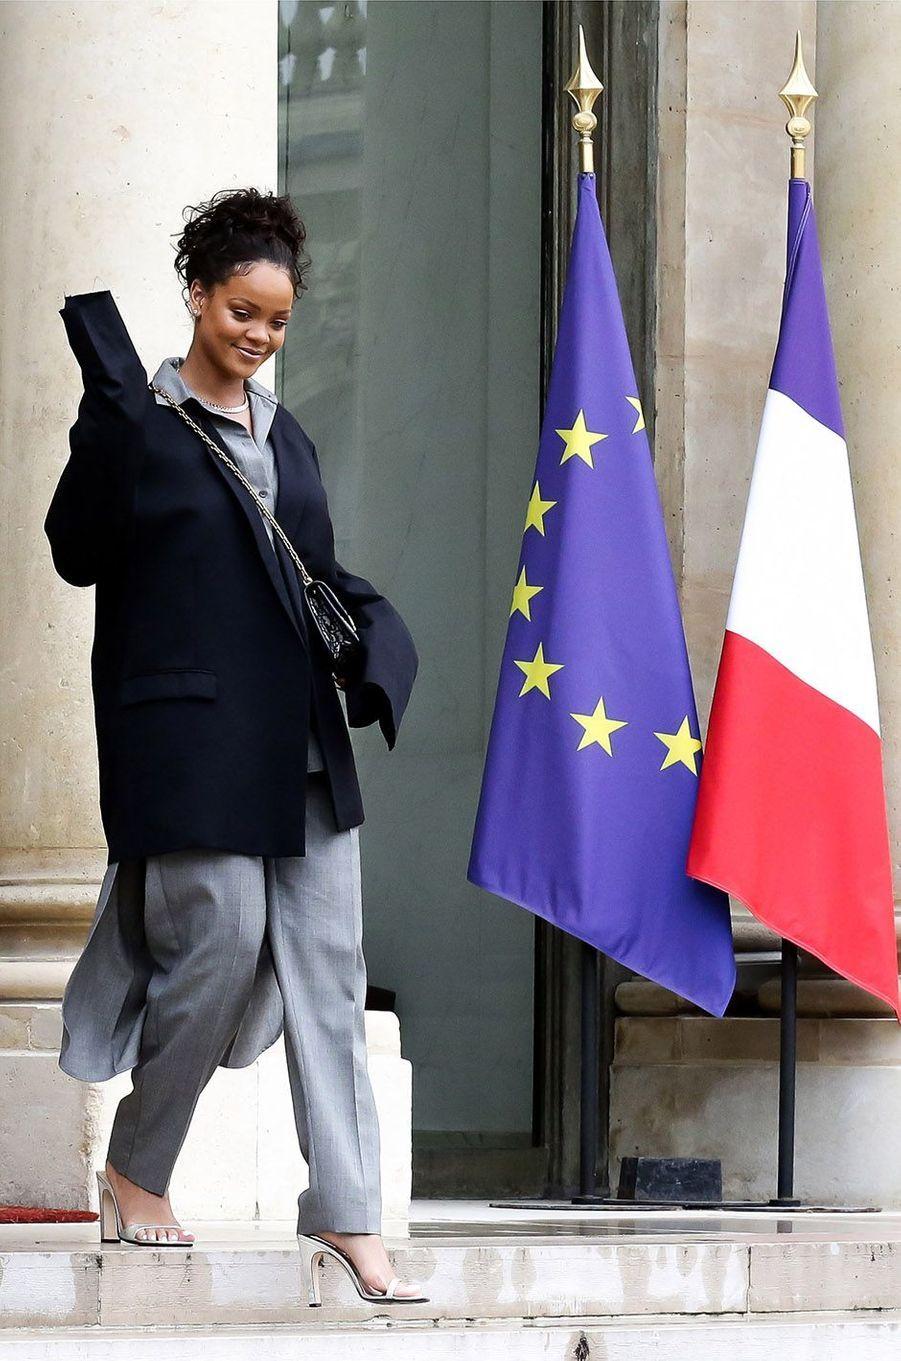 Rihanna lors de sa visite à l'Elysée, le 26 juillet 2017.